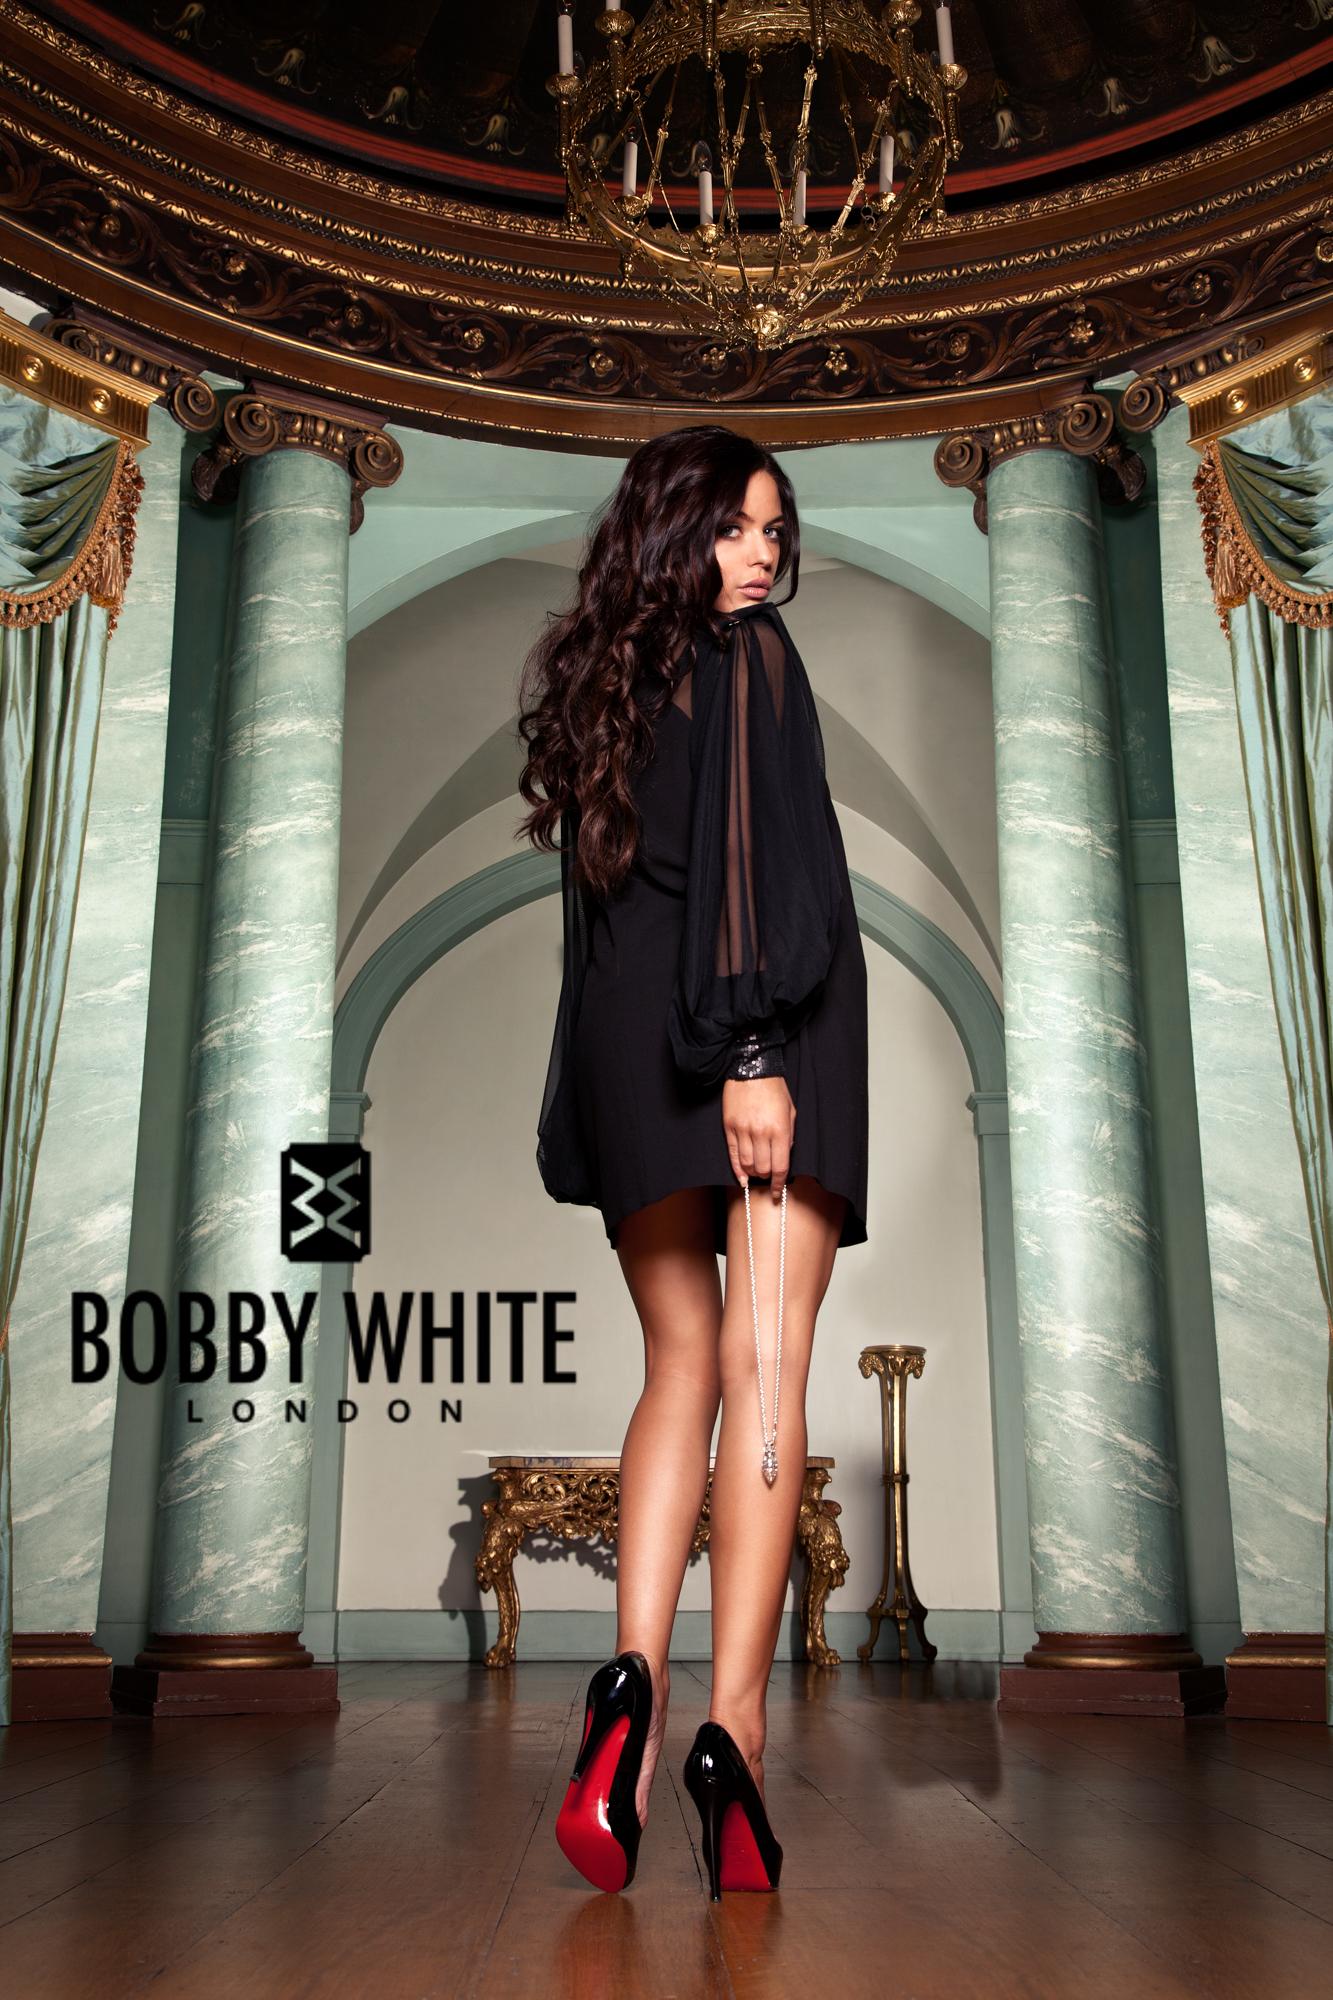 BobbyWhite-RVDS-4-Edit.jpg